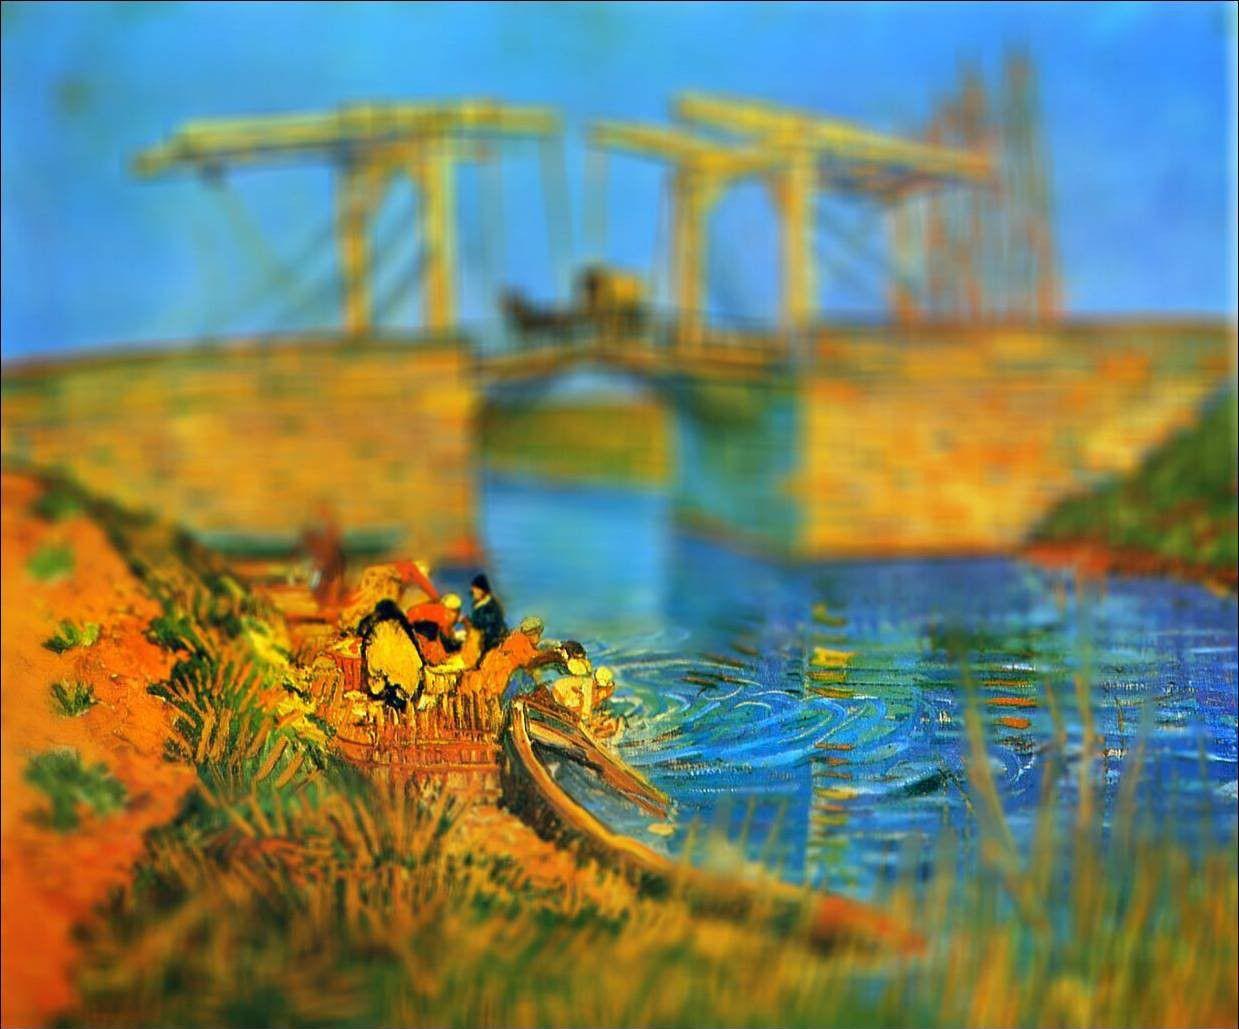 original Van Gogh Painting photographed with tilt shift technique for depth effect